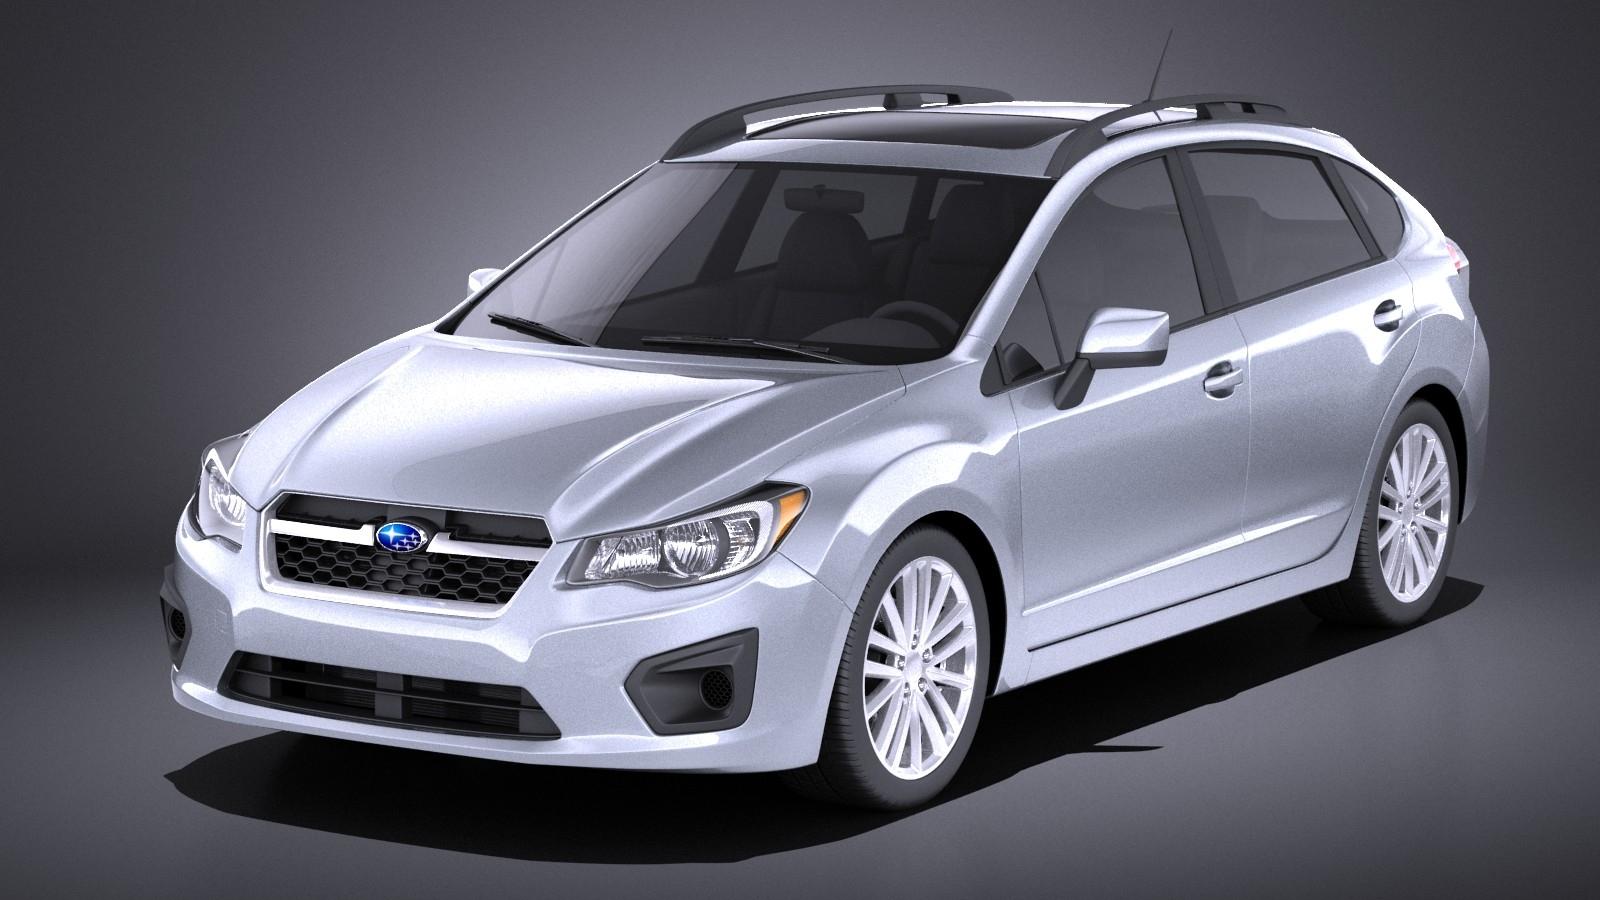 Subaru Impreza 2013 5-door VRAY